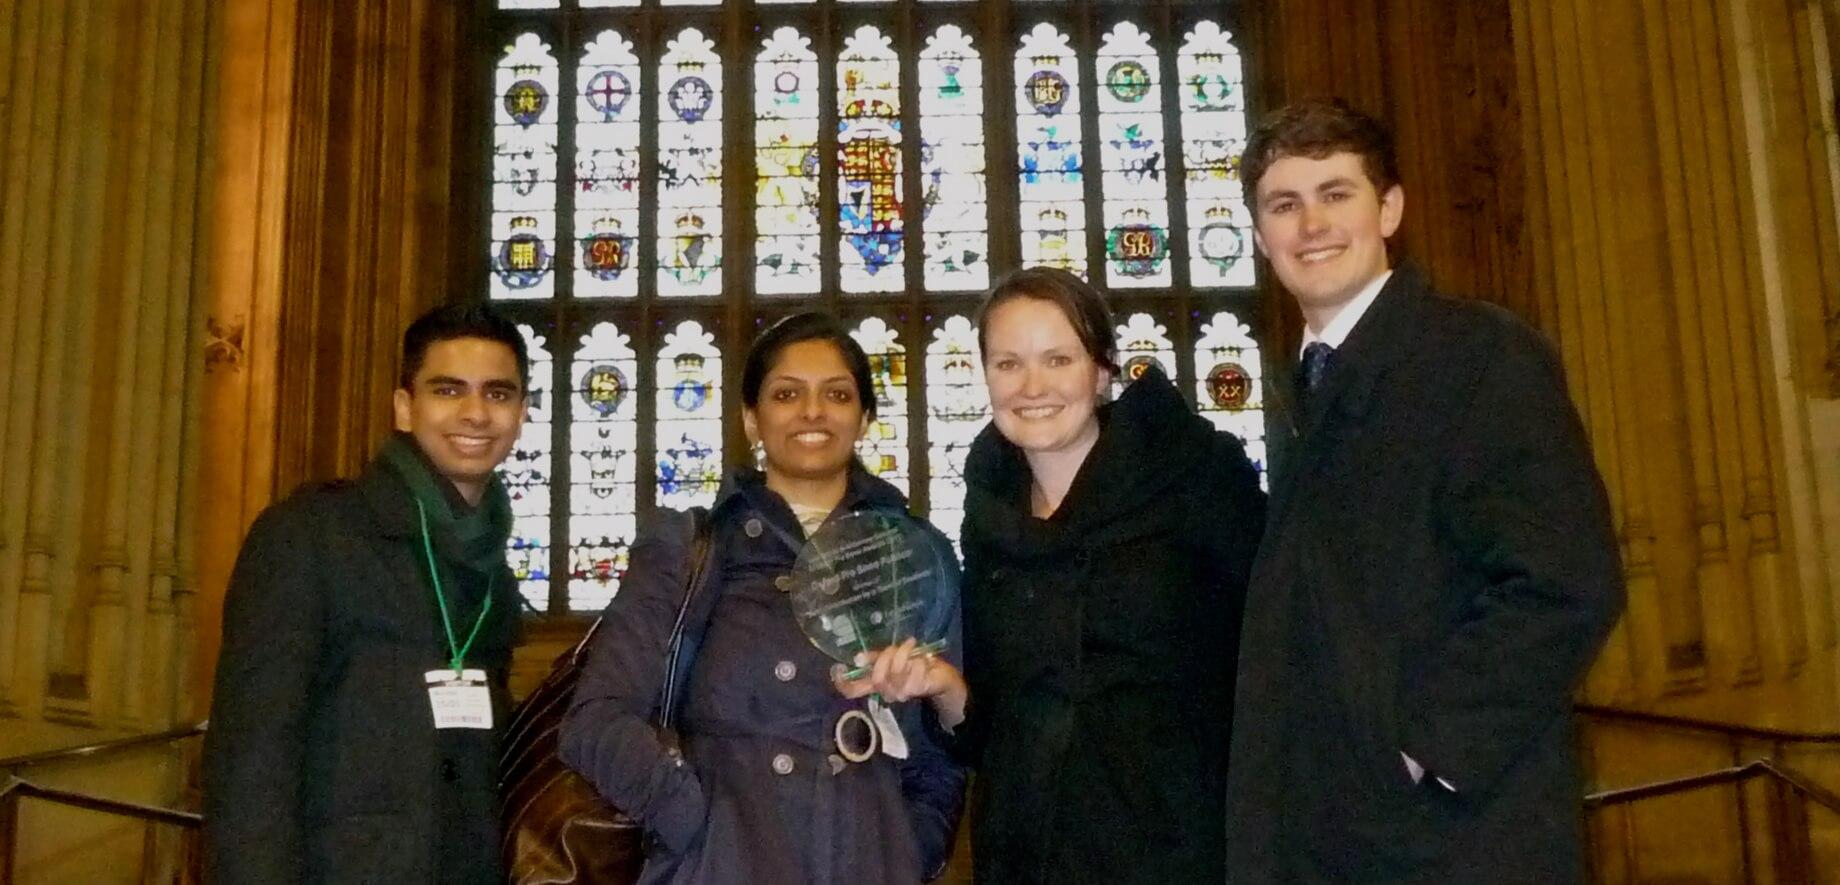 OPBP wins Law Works & Attorney General's Pro Bono Award